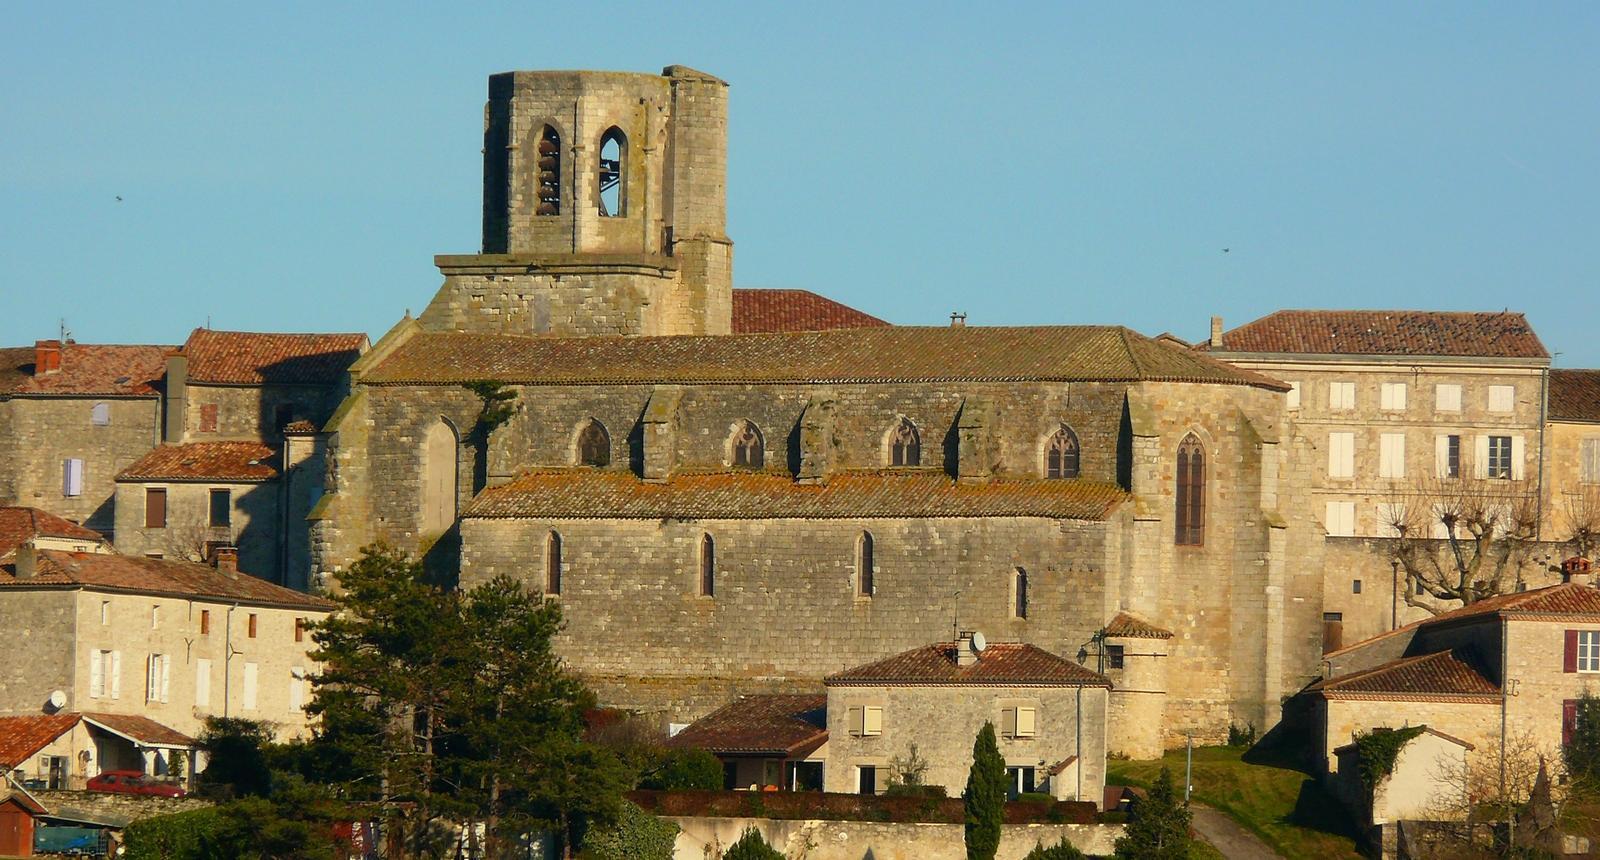 Eglise Saint-Barthélémy de Laplume